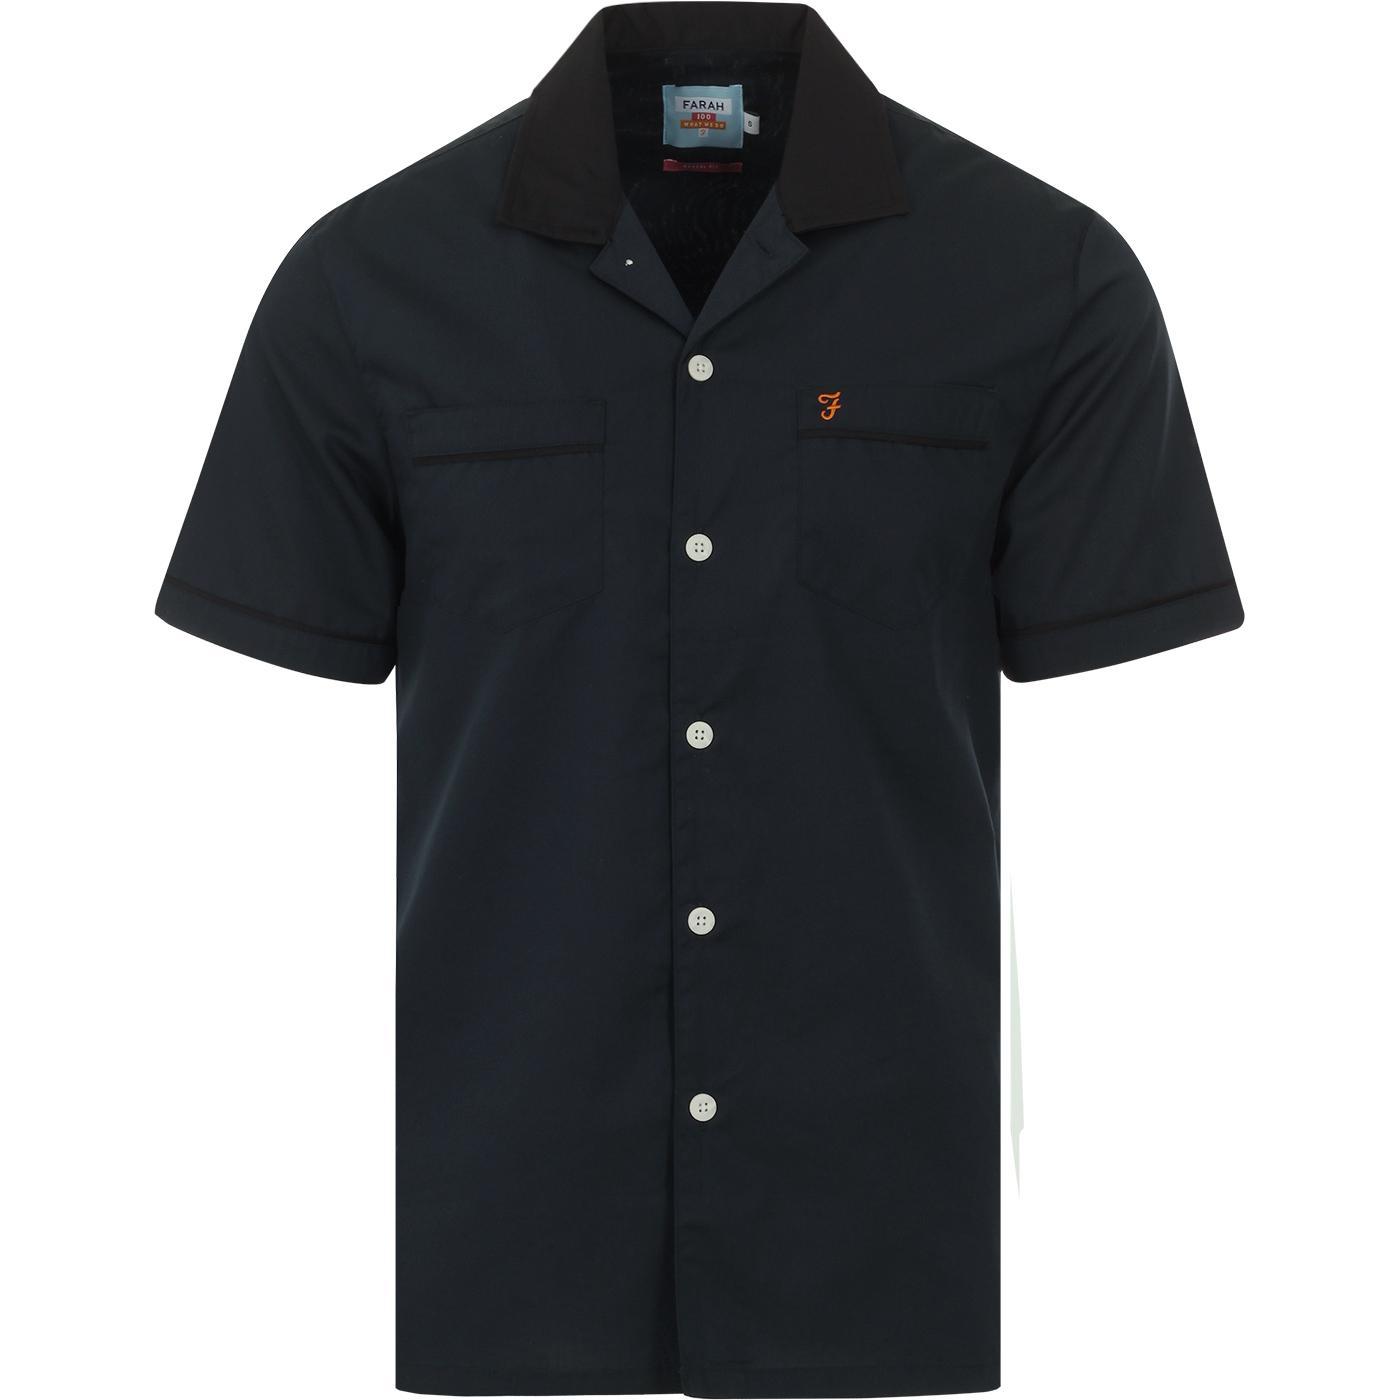 Menard FARAH 100 Revere Collar Bowling Shirt TEAL